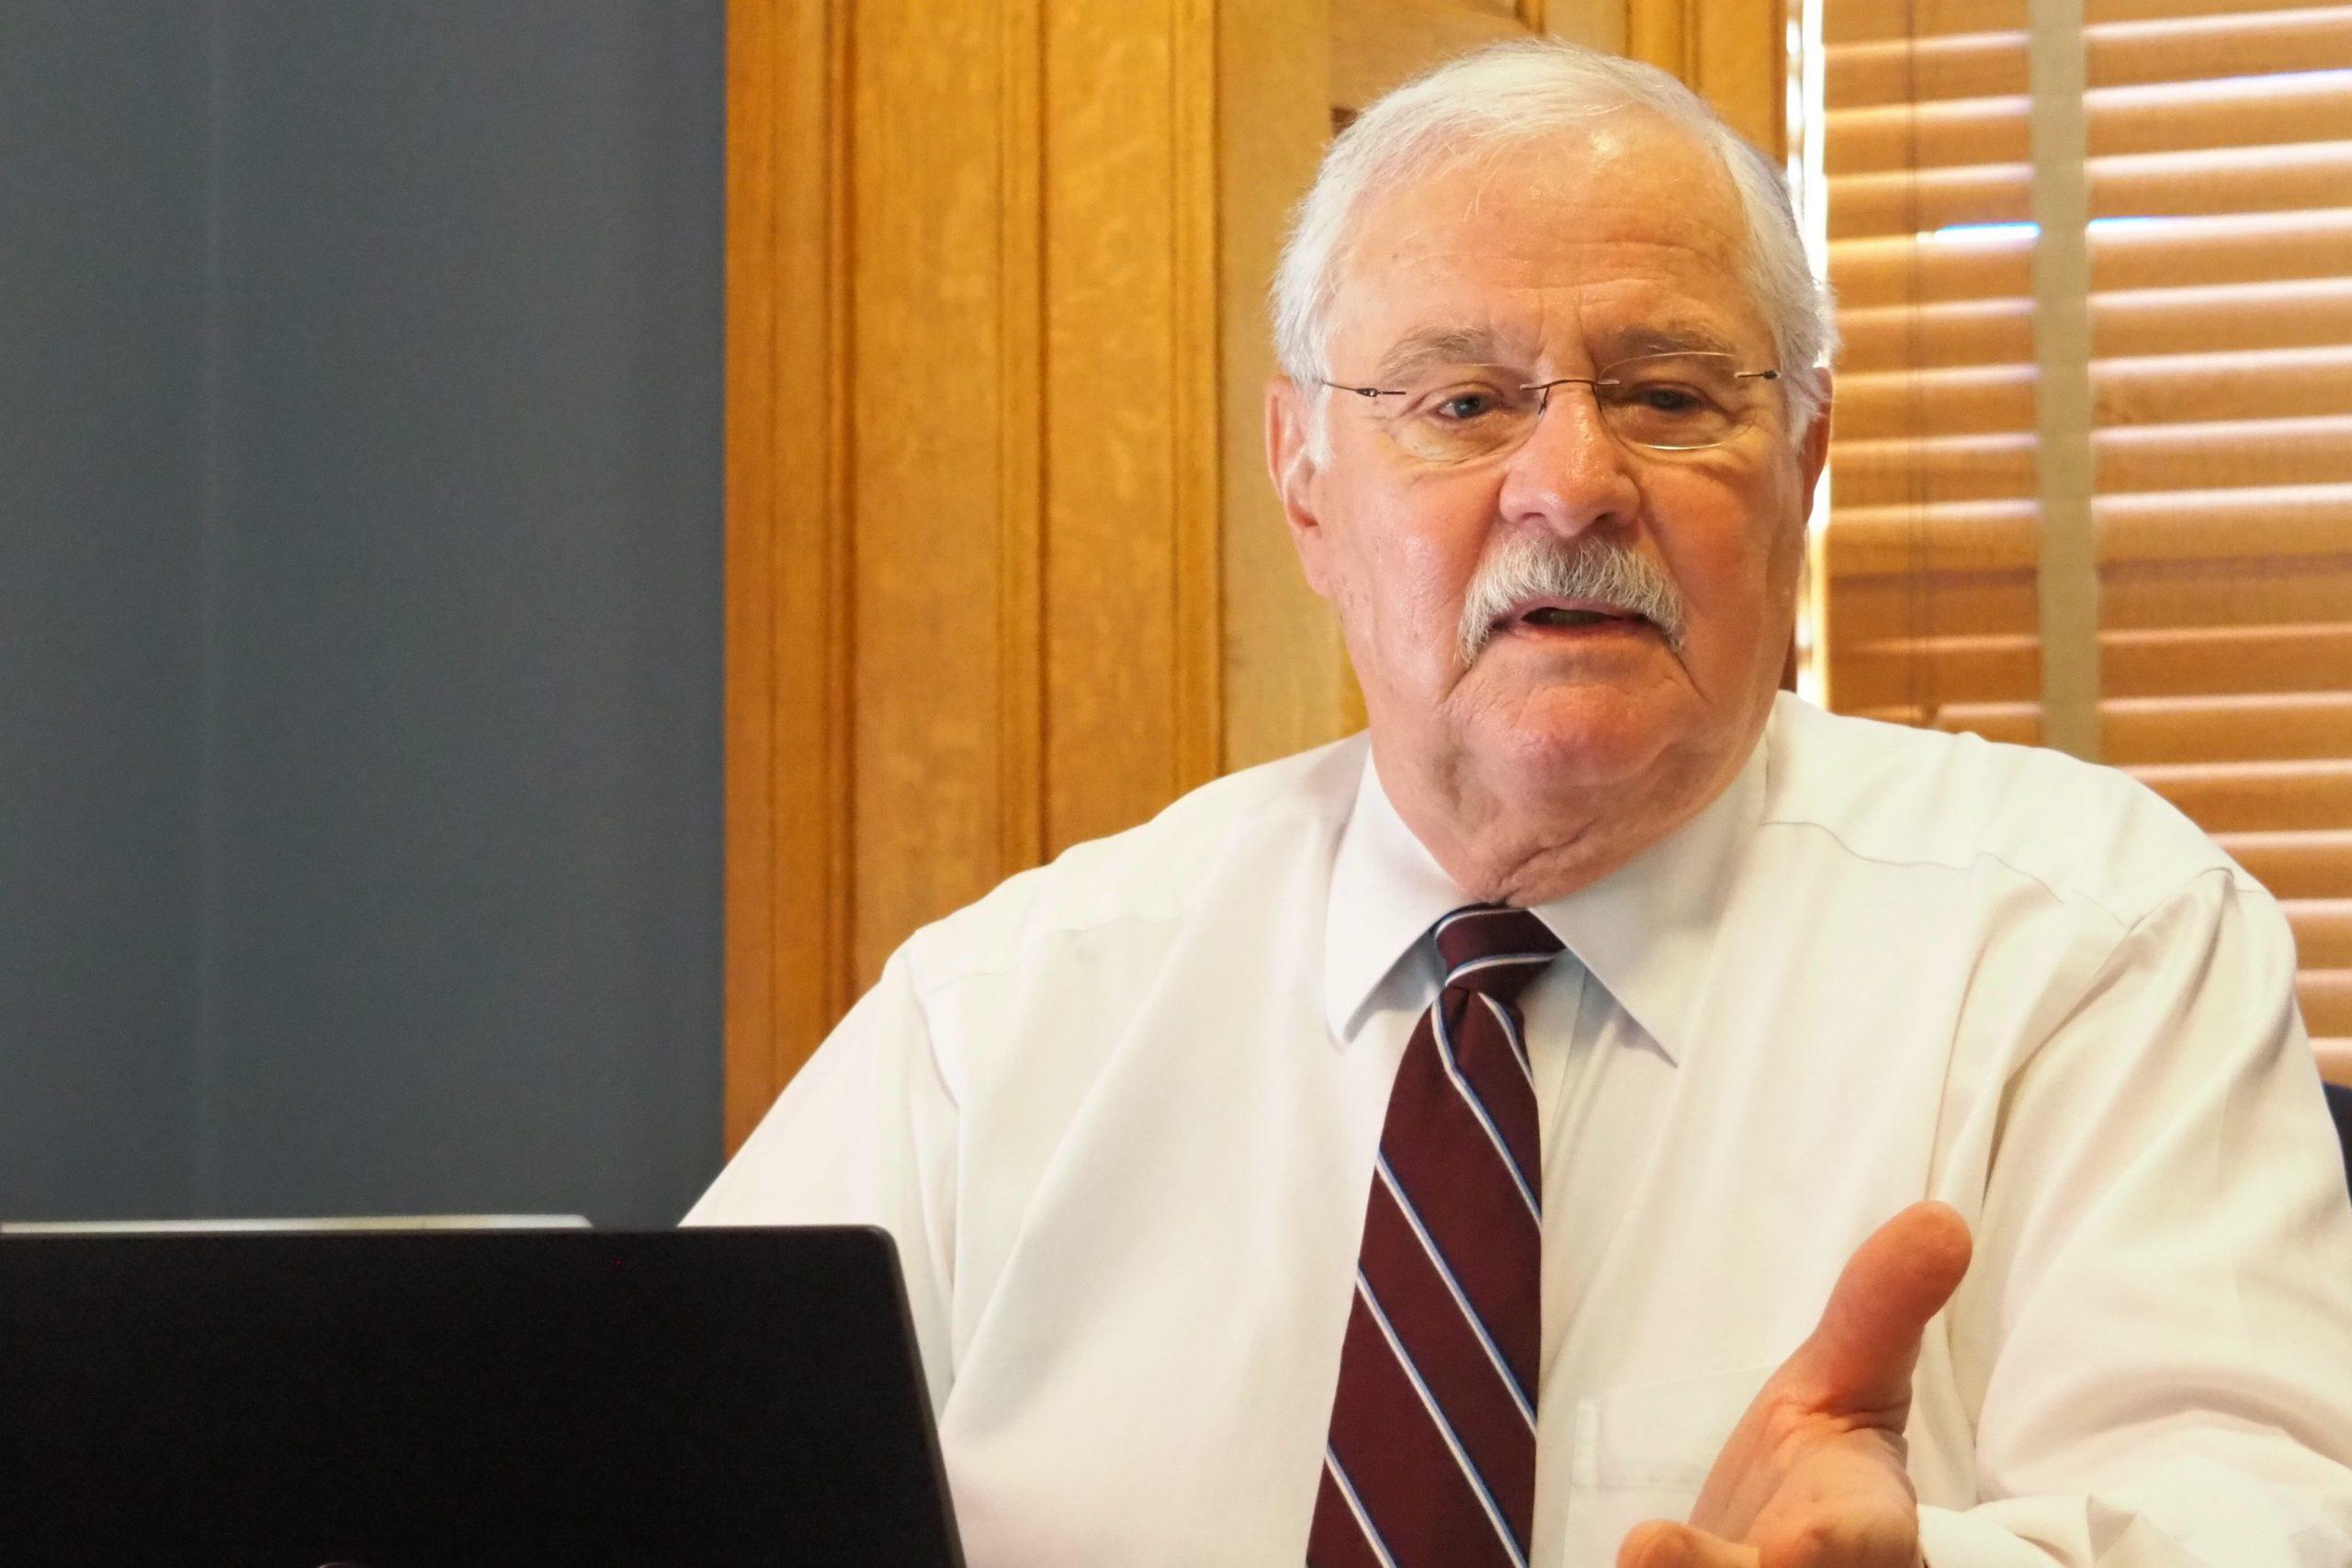 Bills would raise legislators' salaries, increase school employees' contributions to KPERS